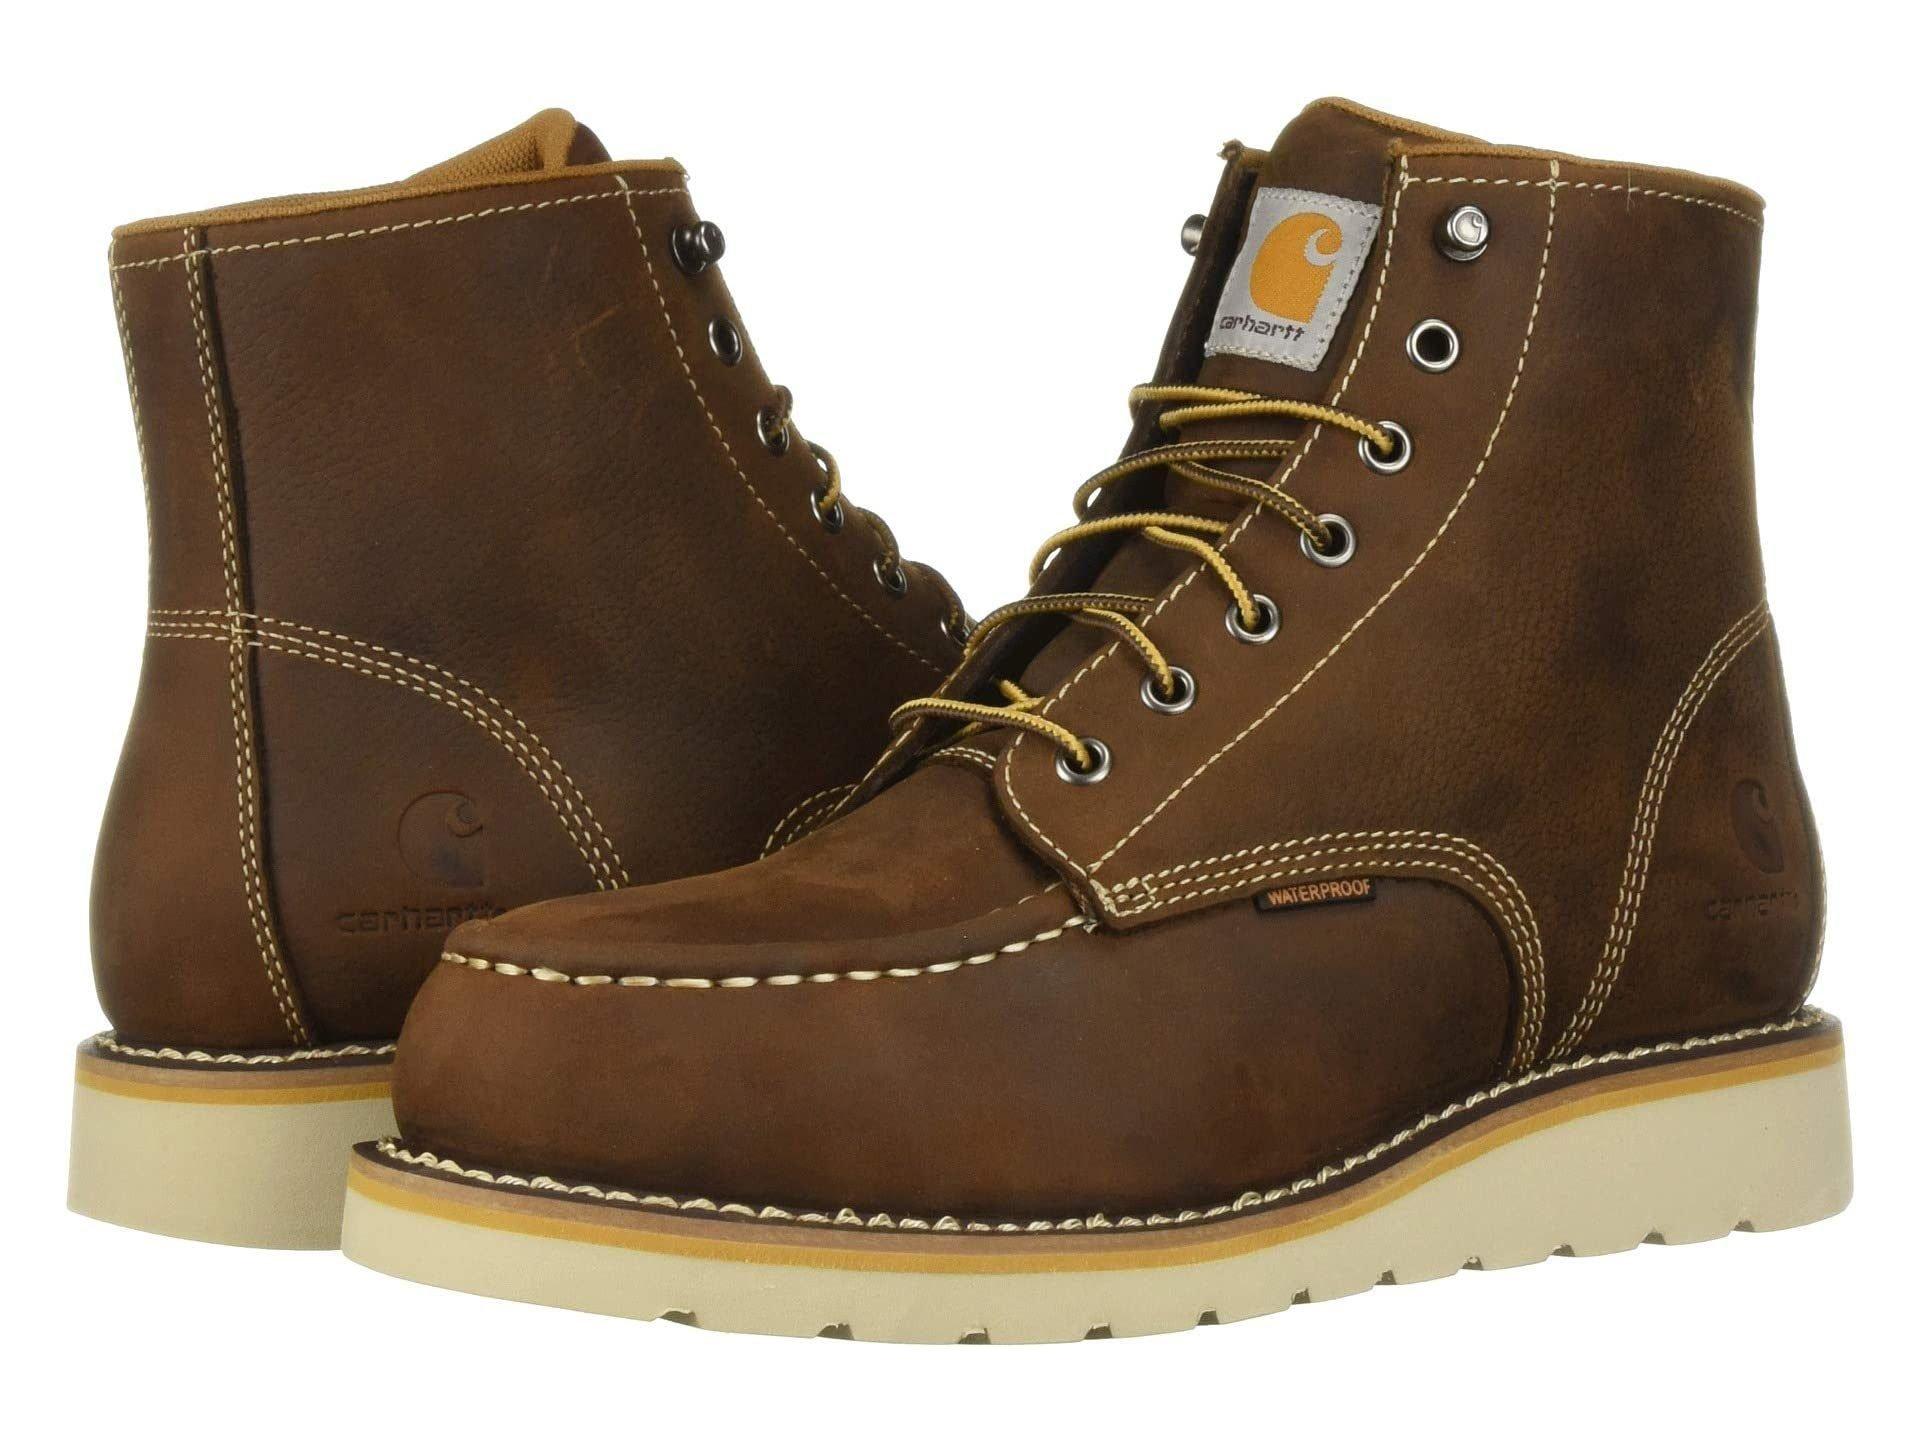 "Carhartt 6"" Steel Toe Waterproof Wedge Boot work boot"